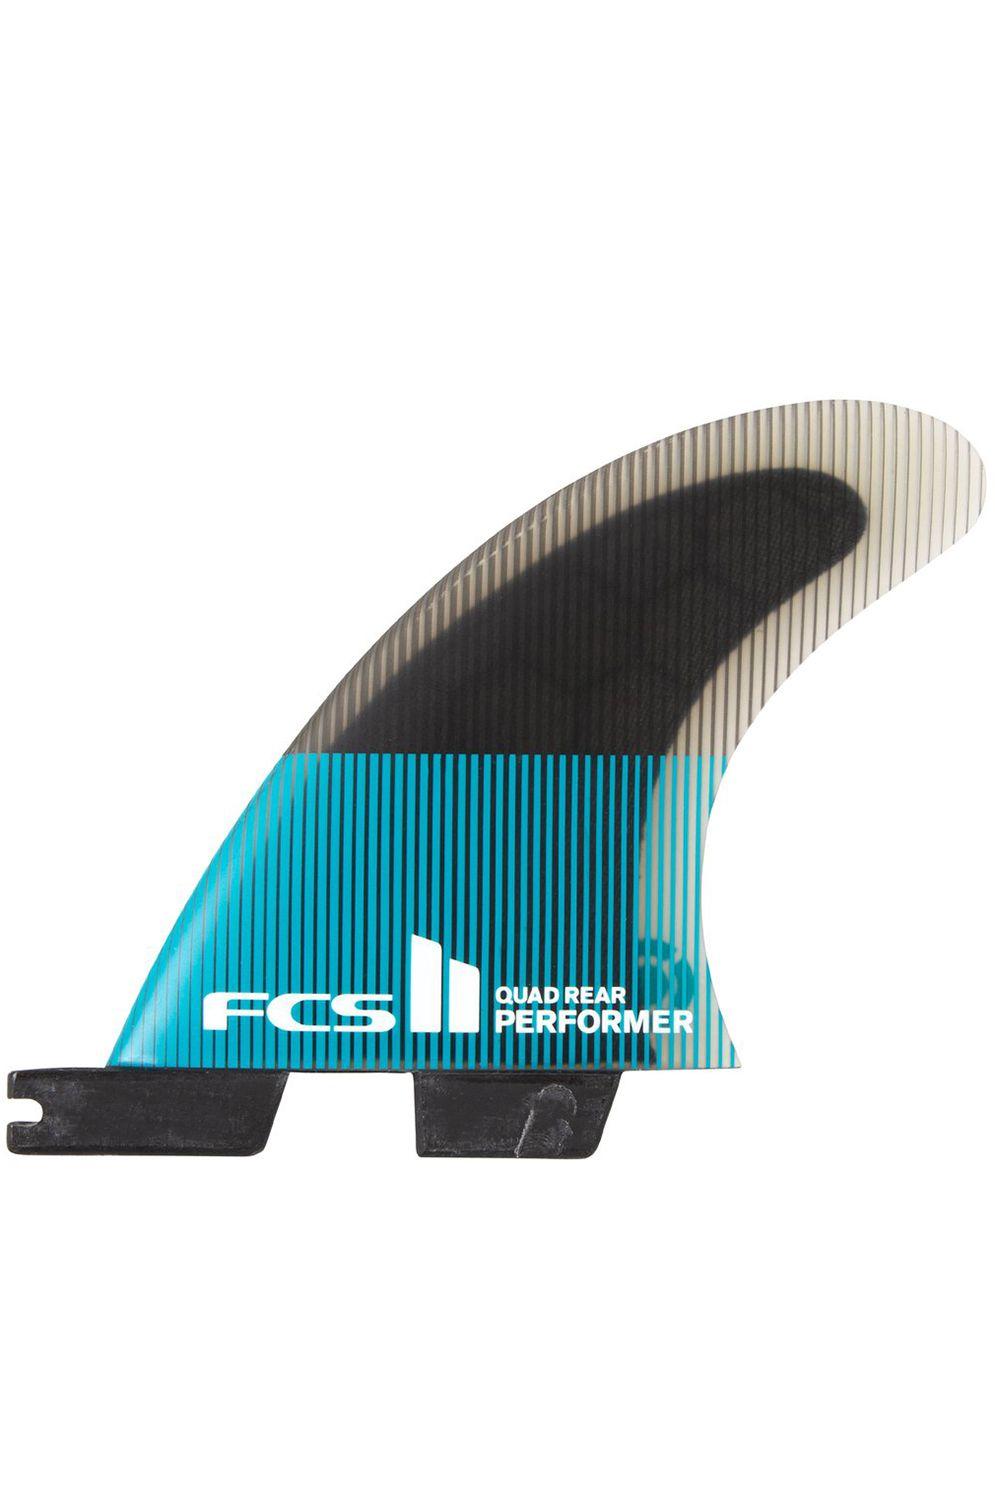 Fcs Fins II PERFORMER PC MEDIUM TEAL/BLACK QUAD REAR Quad Rear FCS II M